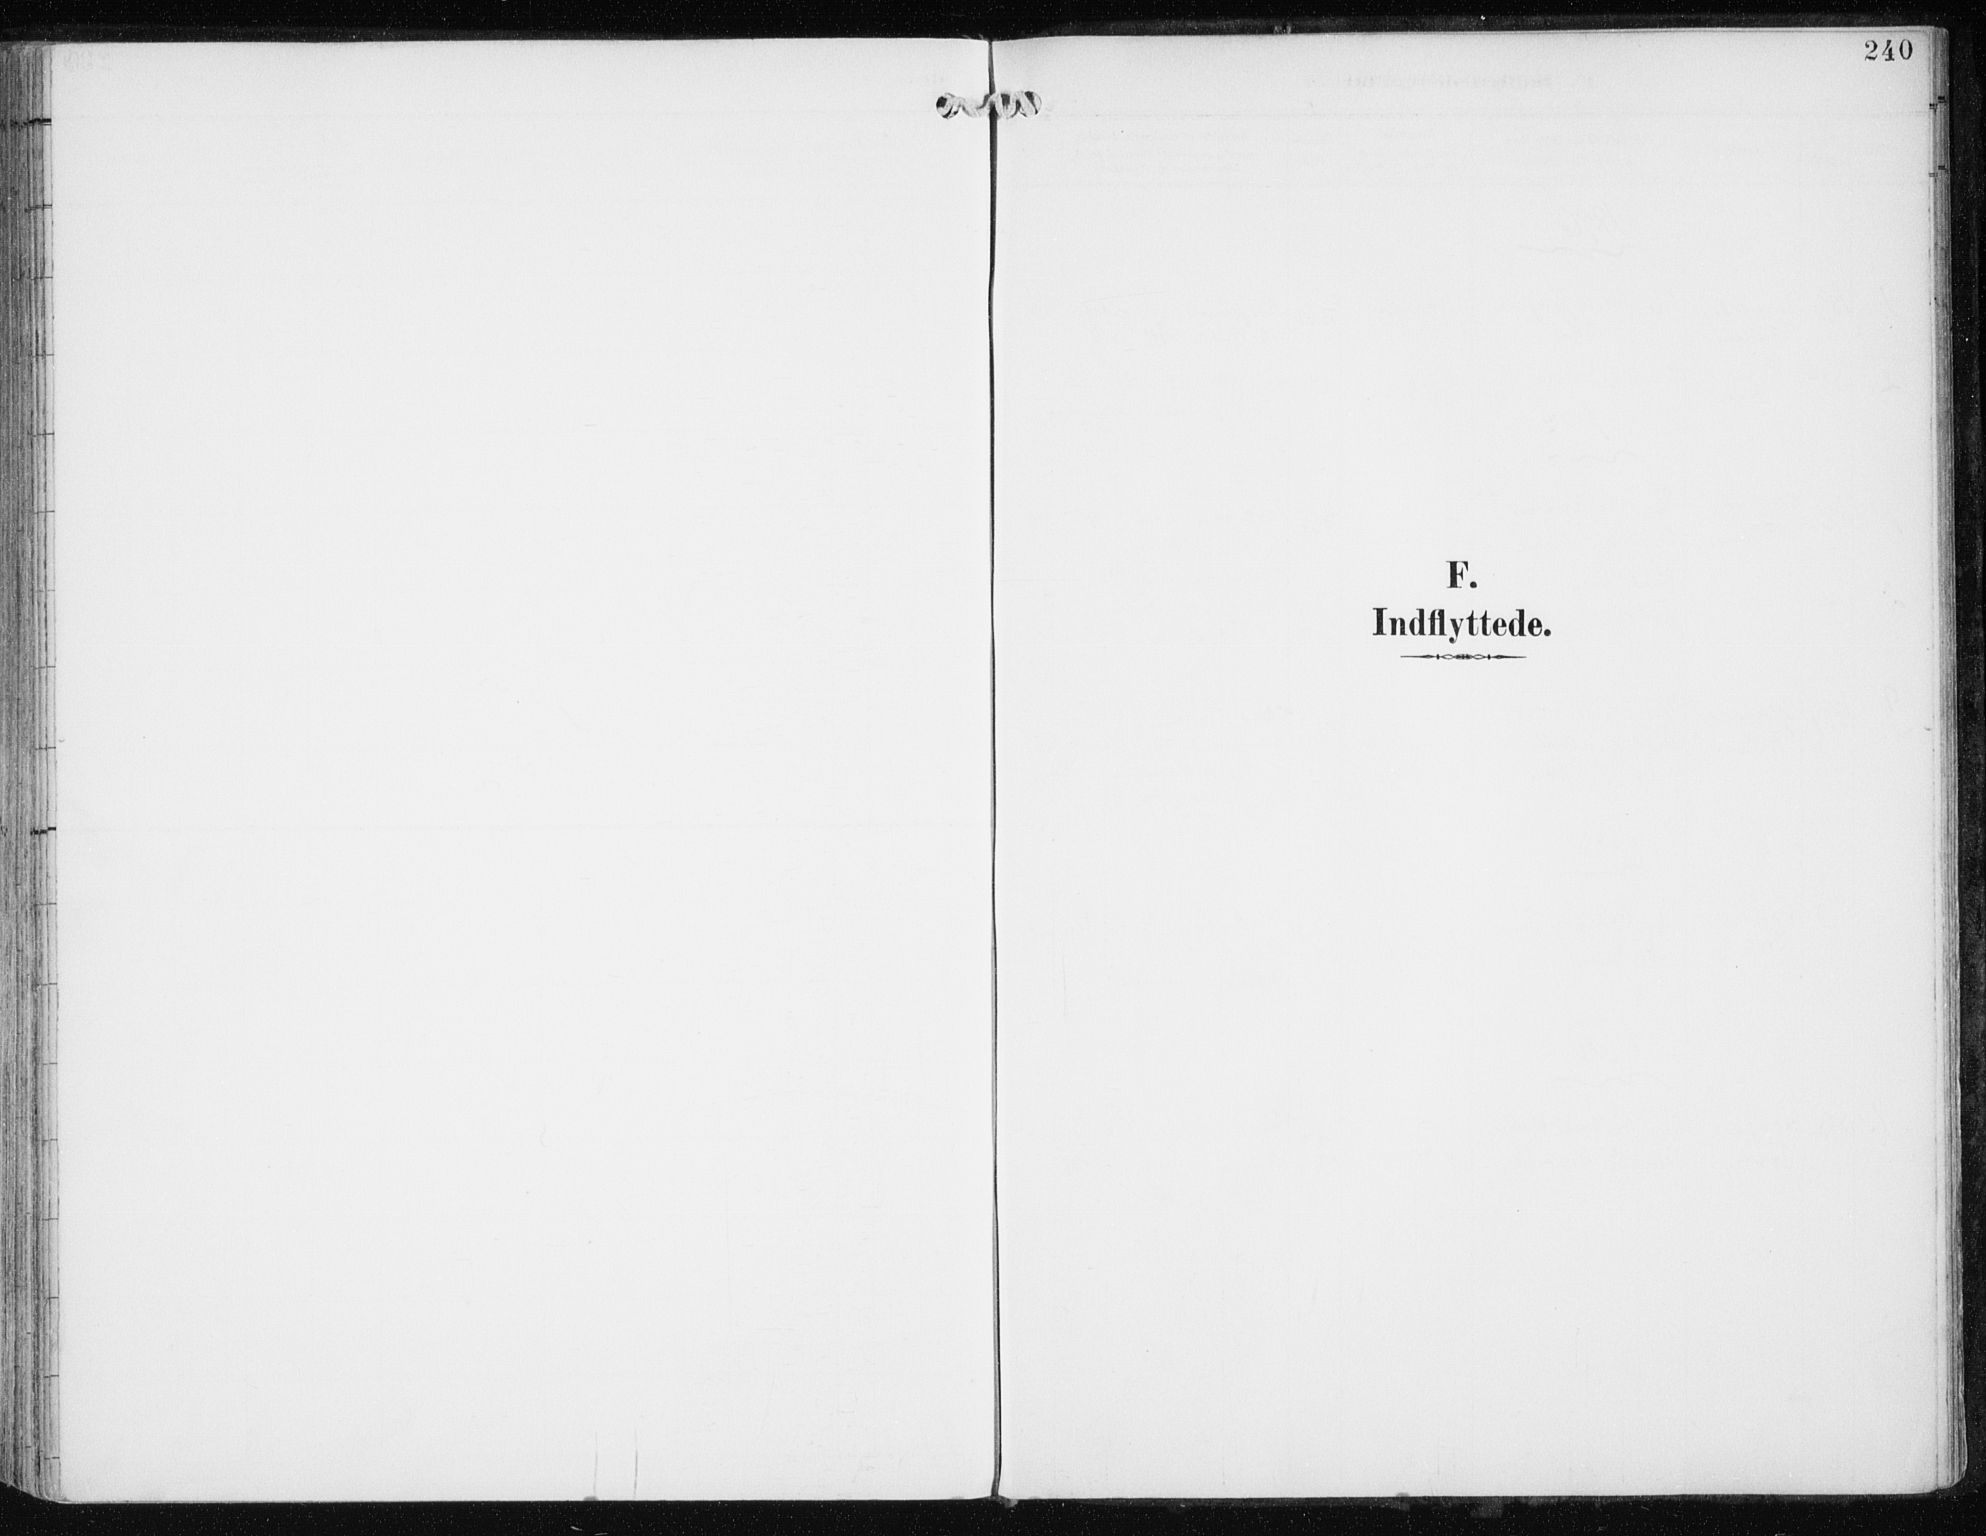 SATØ, Skjervøy sokneprestkontor, H/Ha/Haa/L0017kirke: Ministerialbok nr. 17, 1895-1911, s. 240